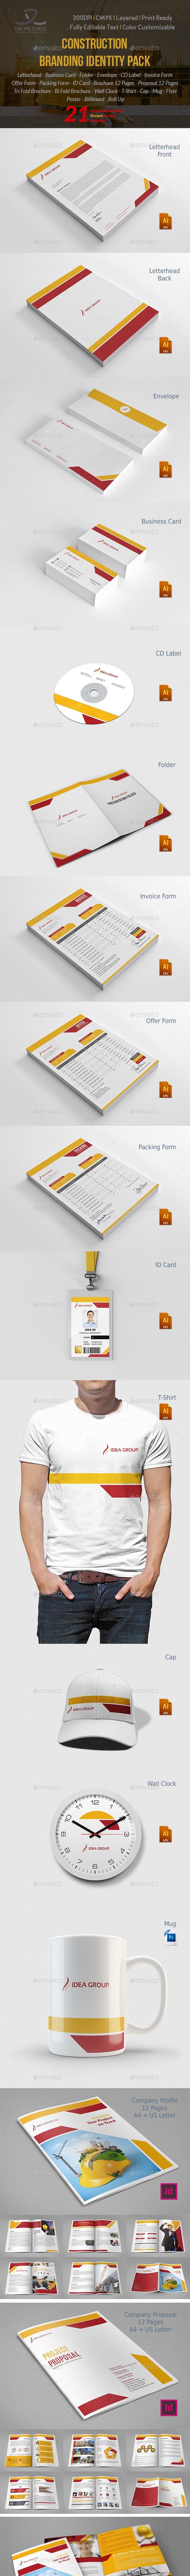 Construction Company Branding Identity - Stationery Print Templates